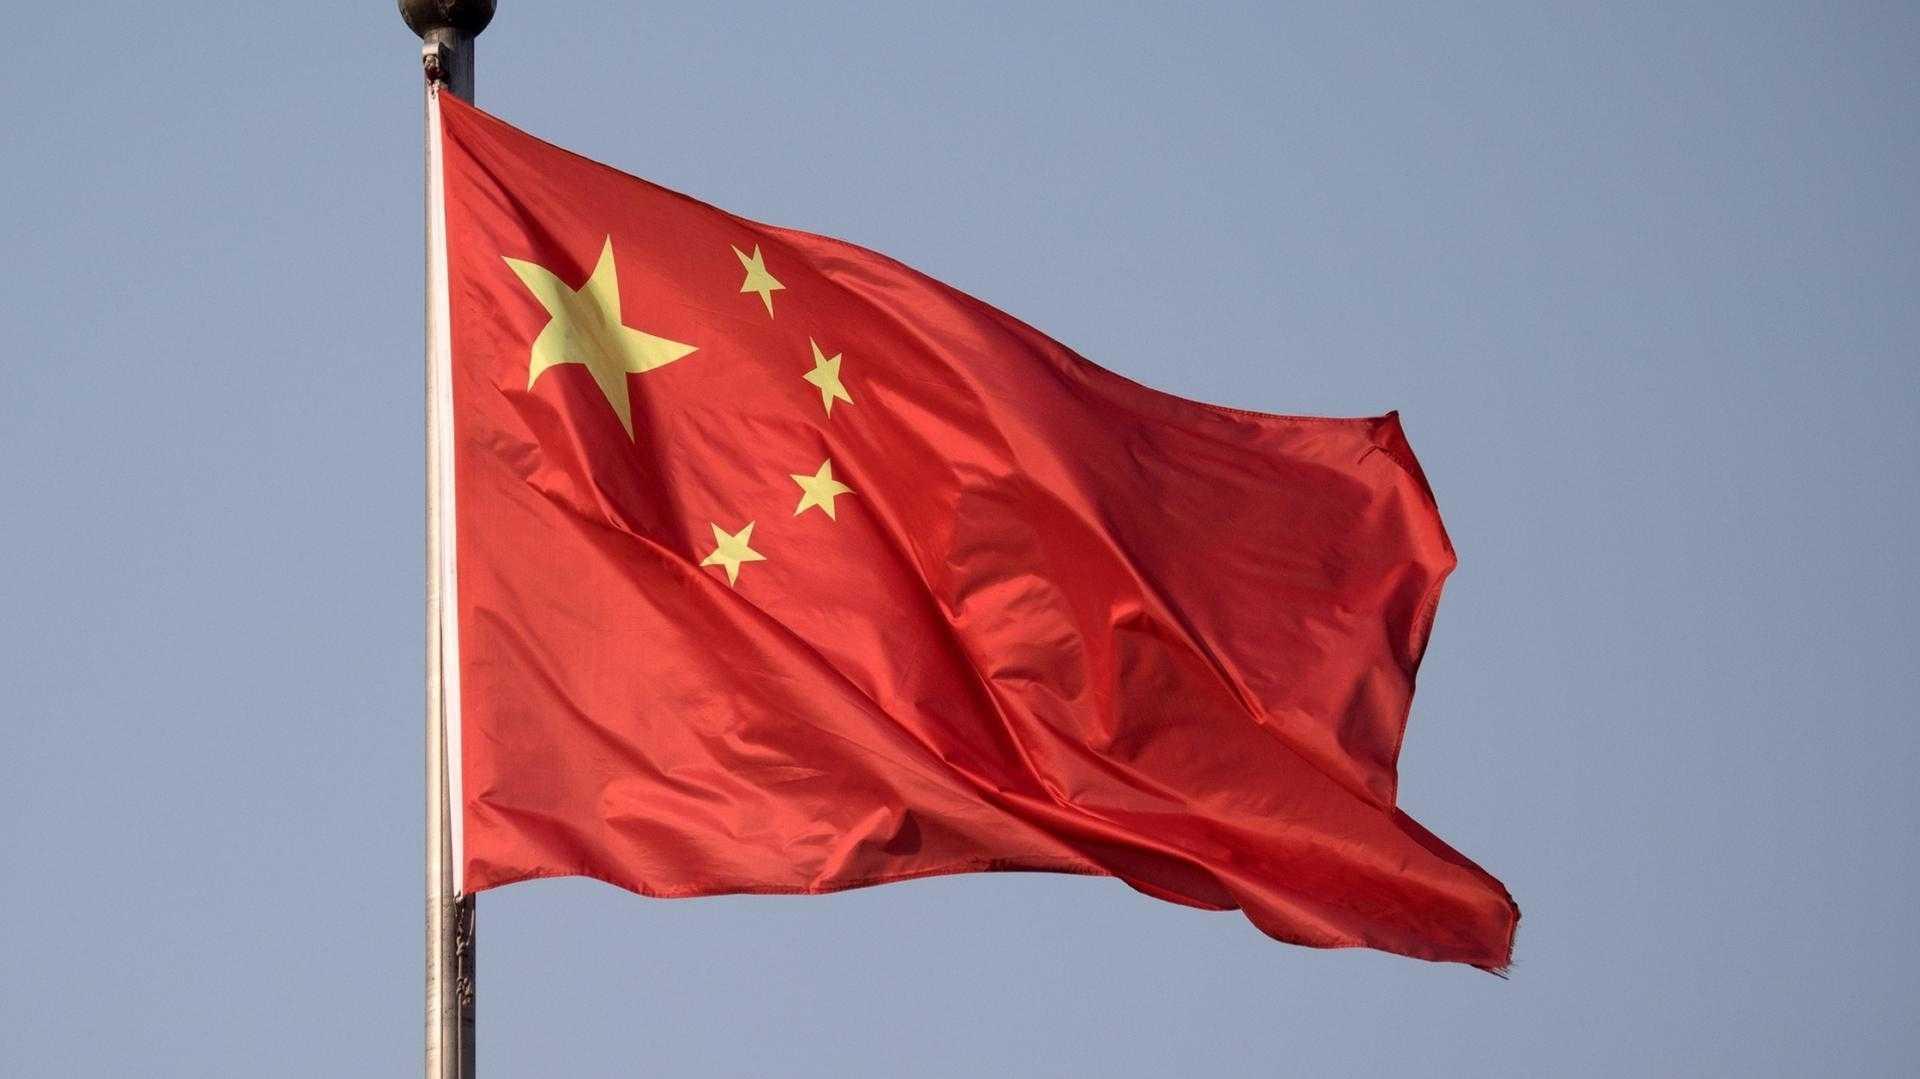 Deutsche Industrie fordert härteren Kurs gegenüber China